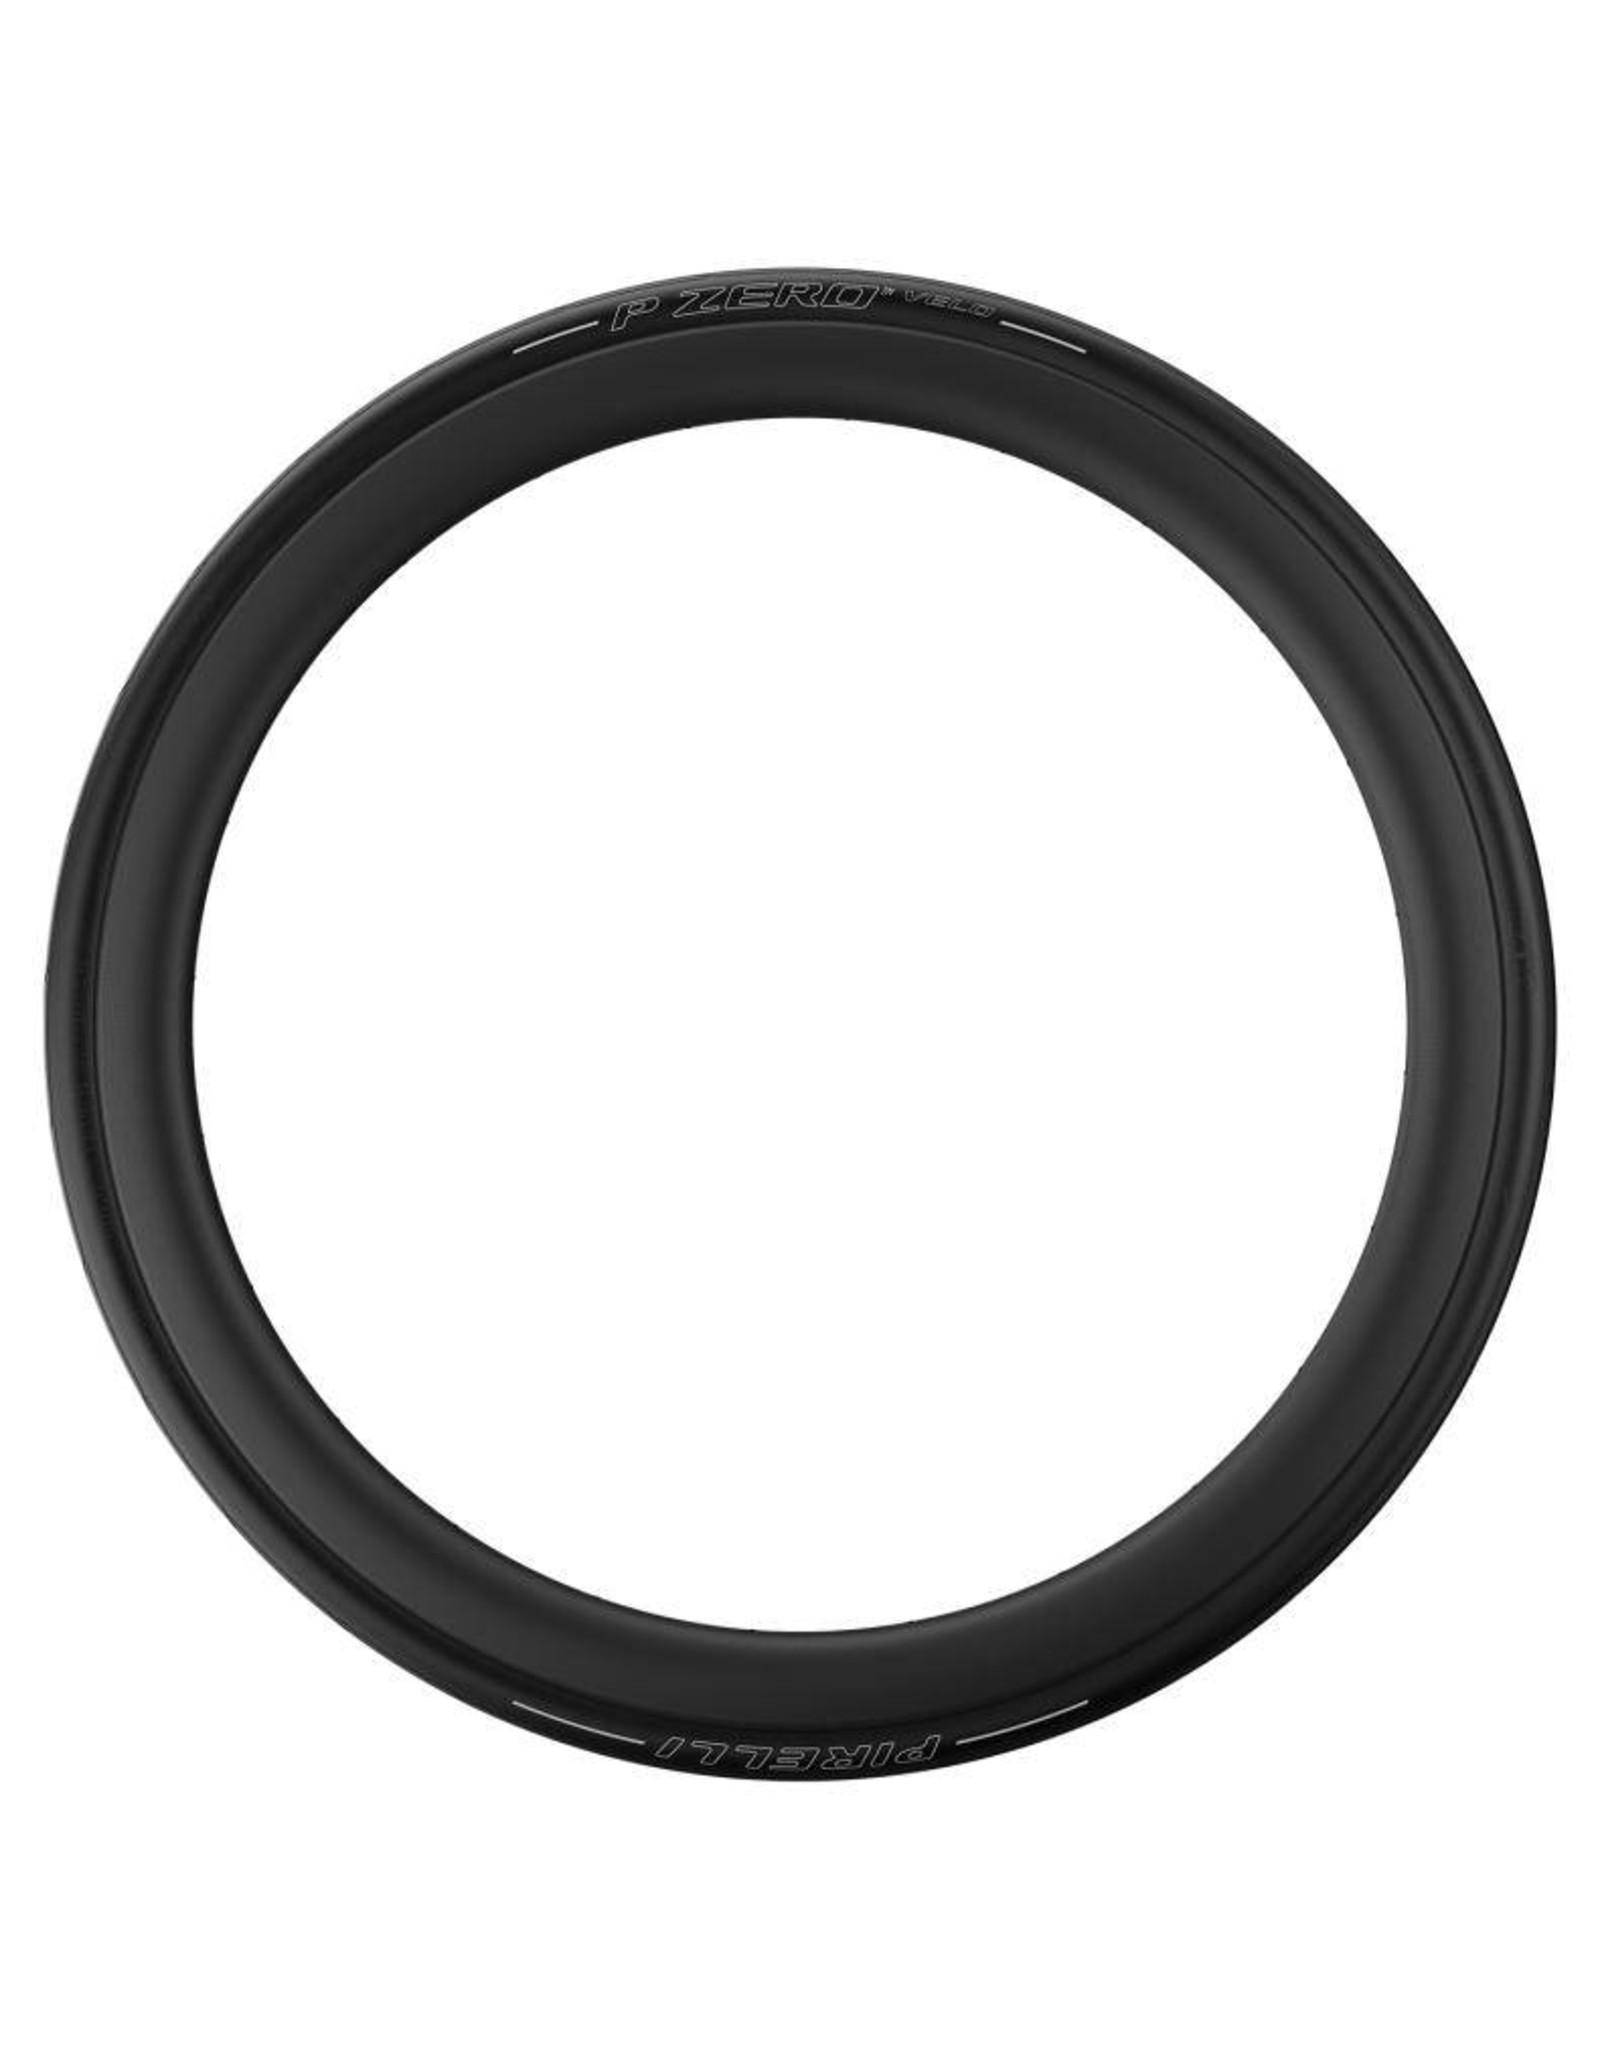 Pirelli Pirelli PZero Velo700x25C Folding, Smartnet Silica, Aramid Fiber, 127TPI, 210g, Black